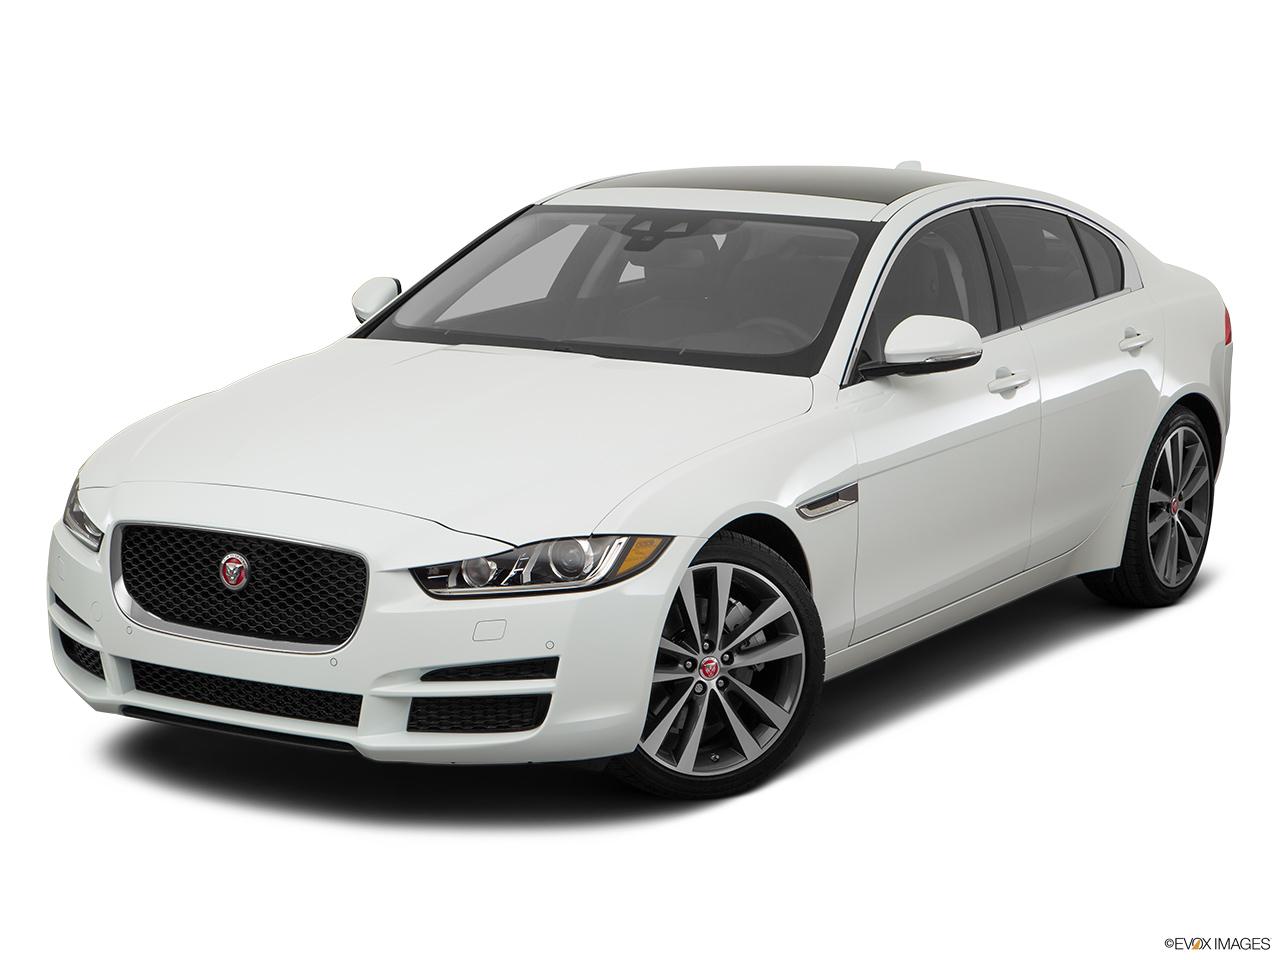 s test short road reviews xf photo car original take jaguar prices